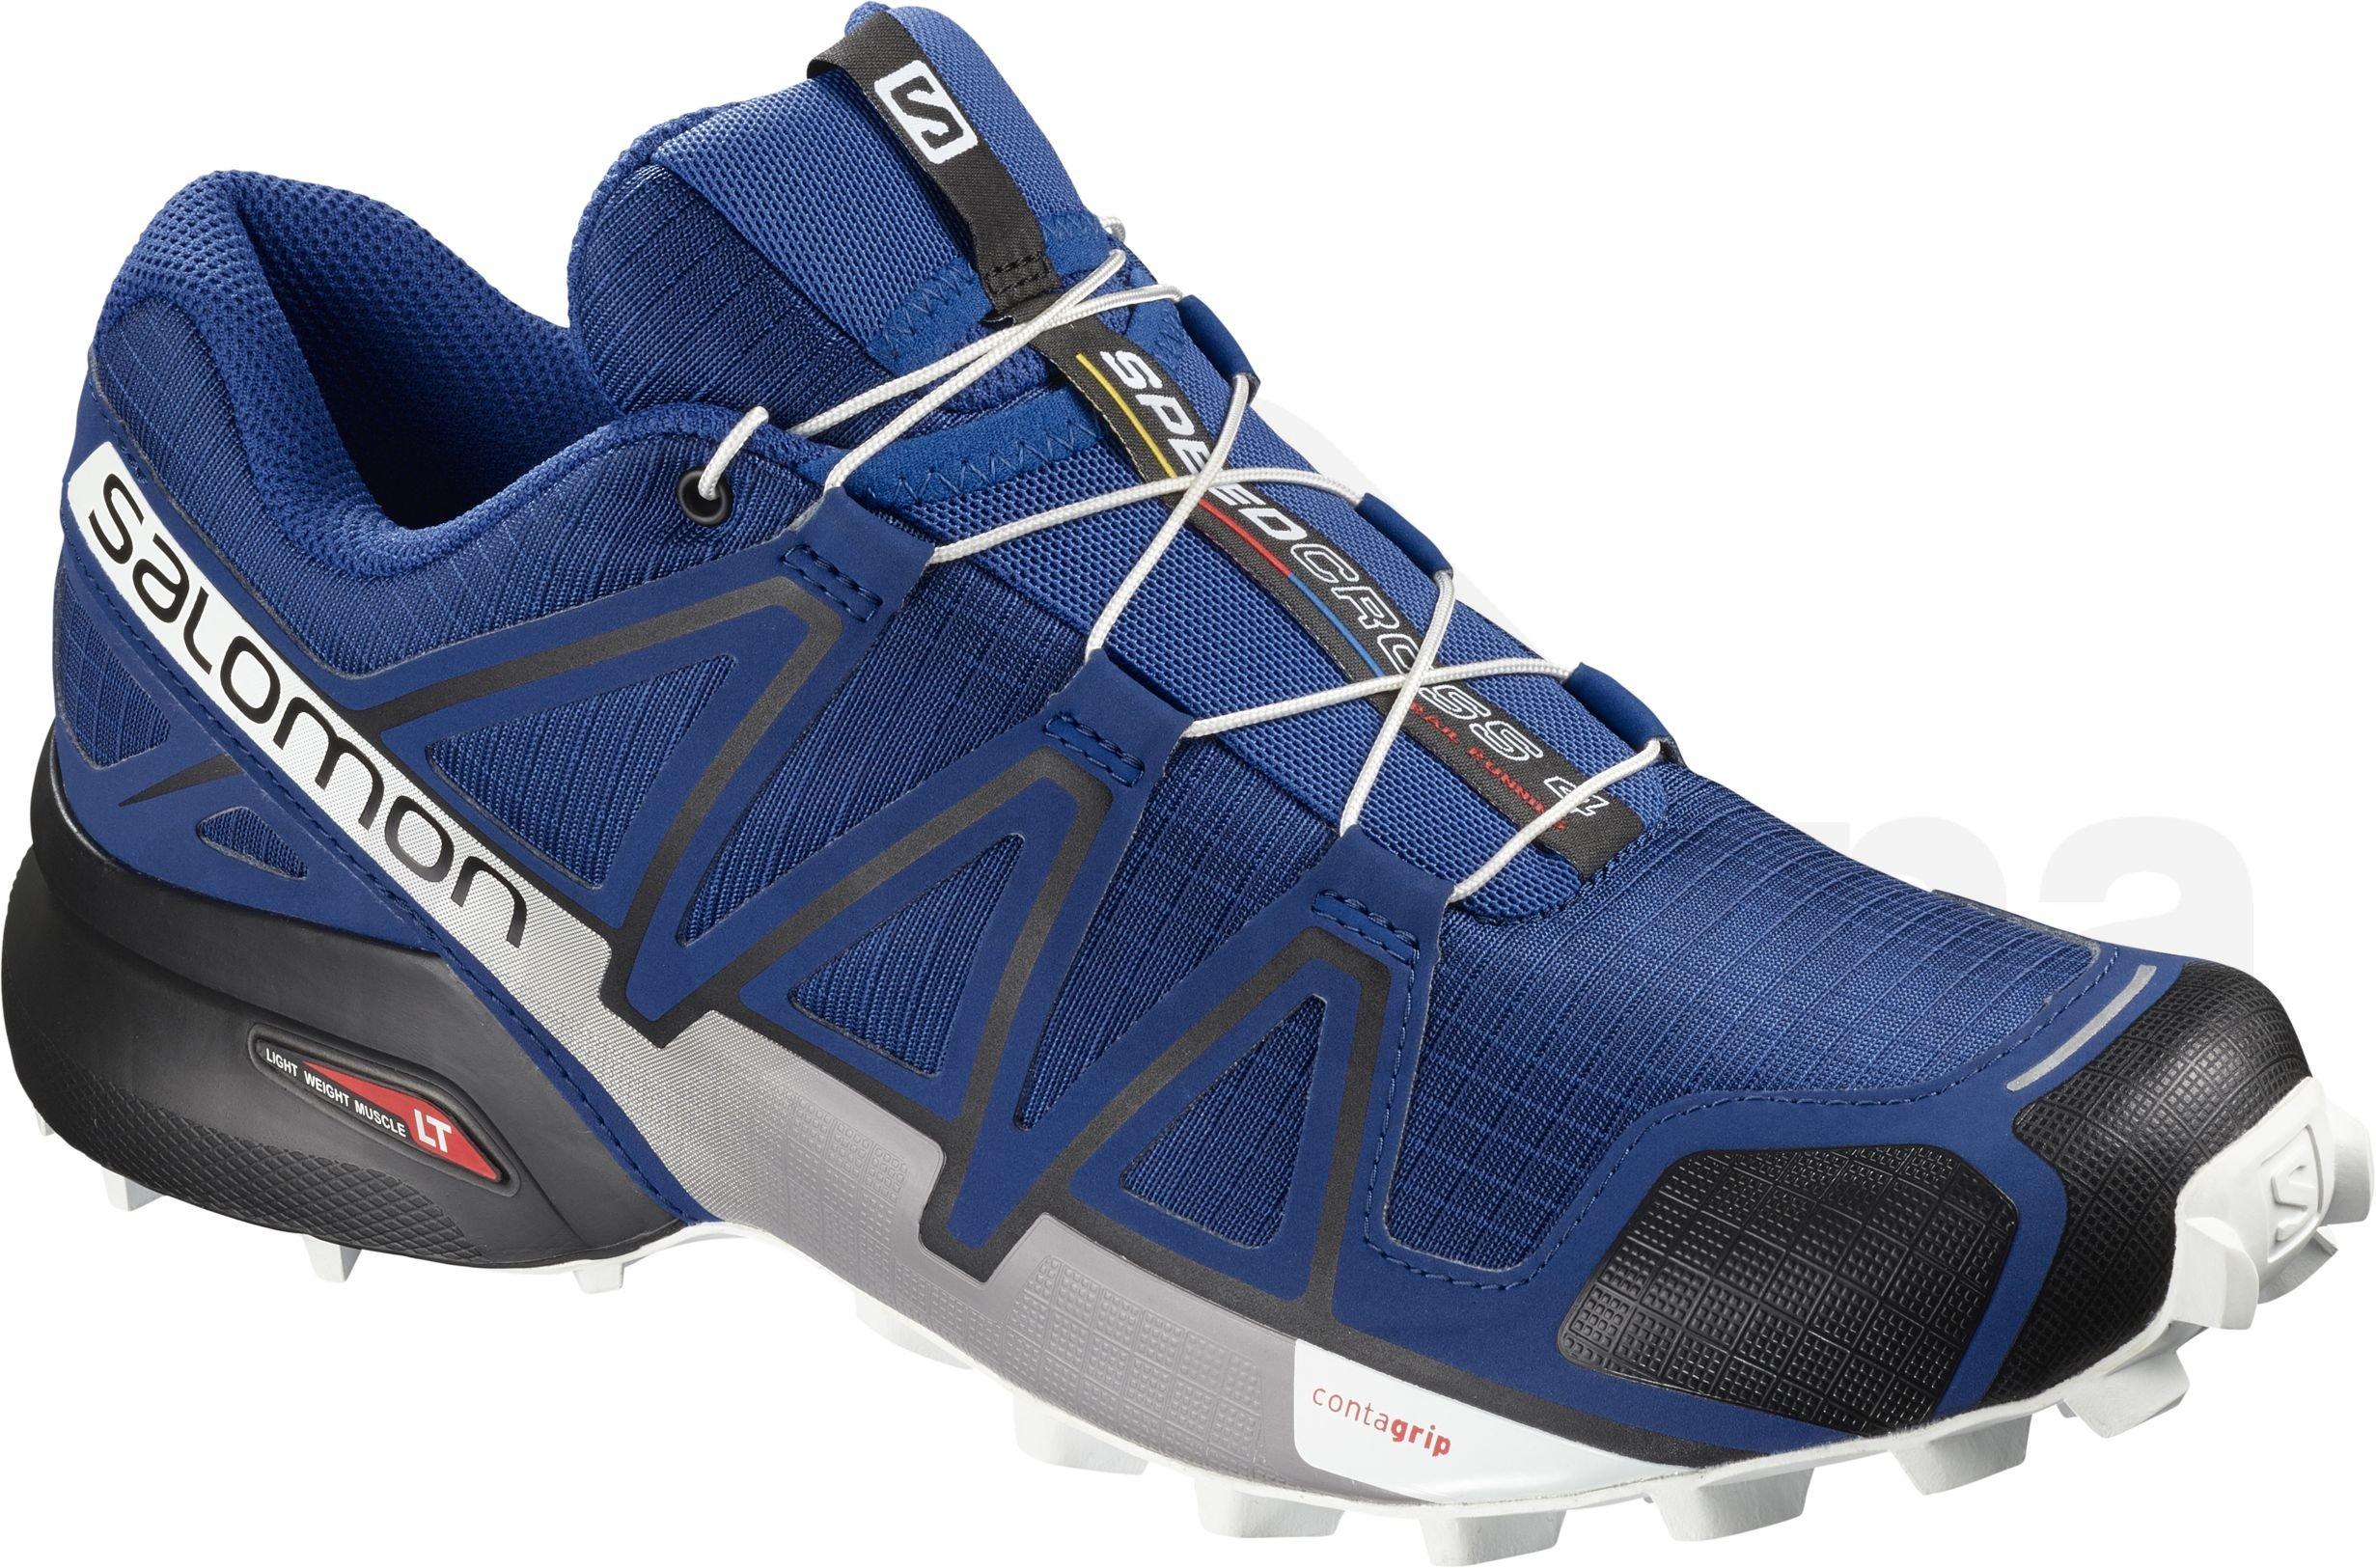 f80945aa114 L40464100 0 M speedcross 4 mazarine blue.jpg.originale